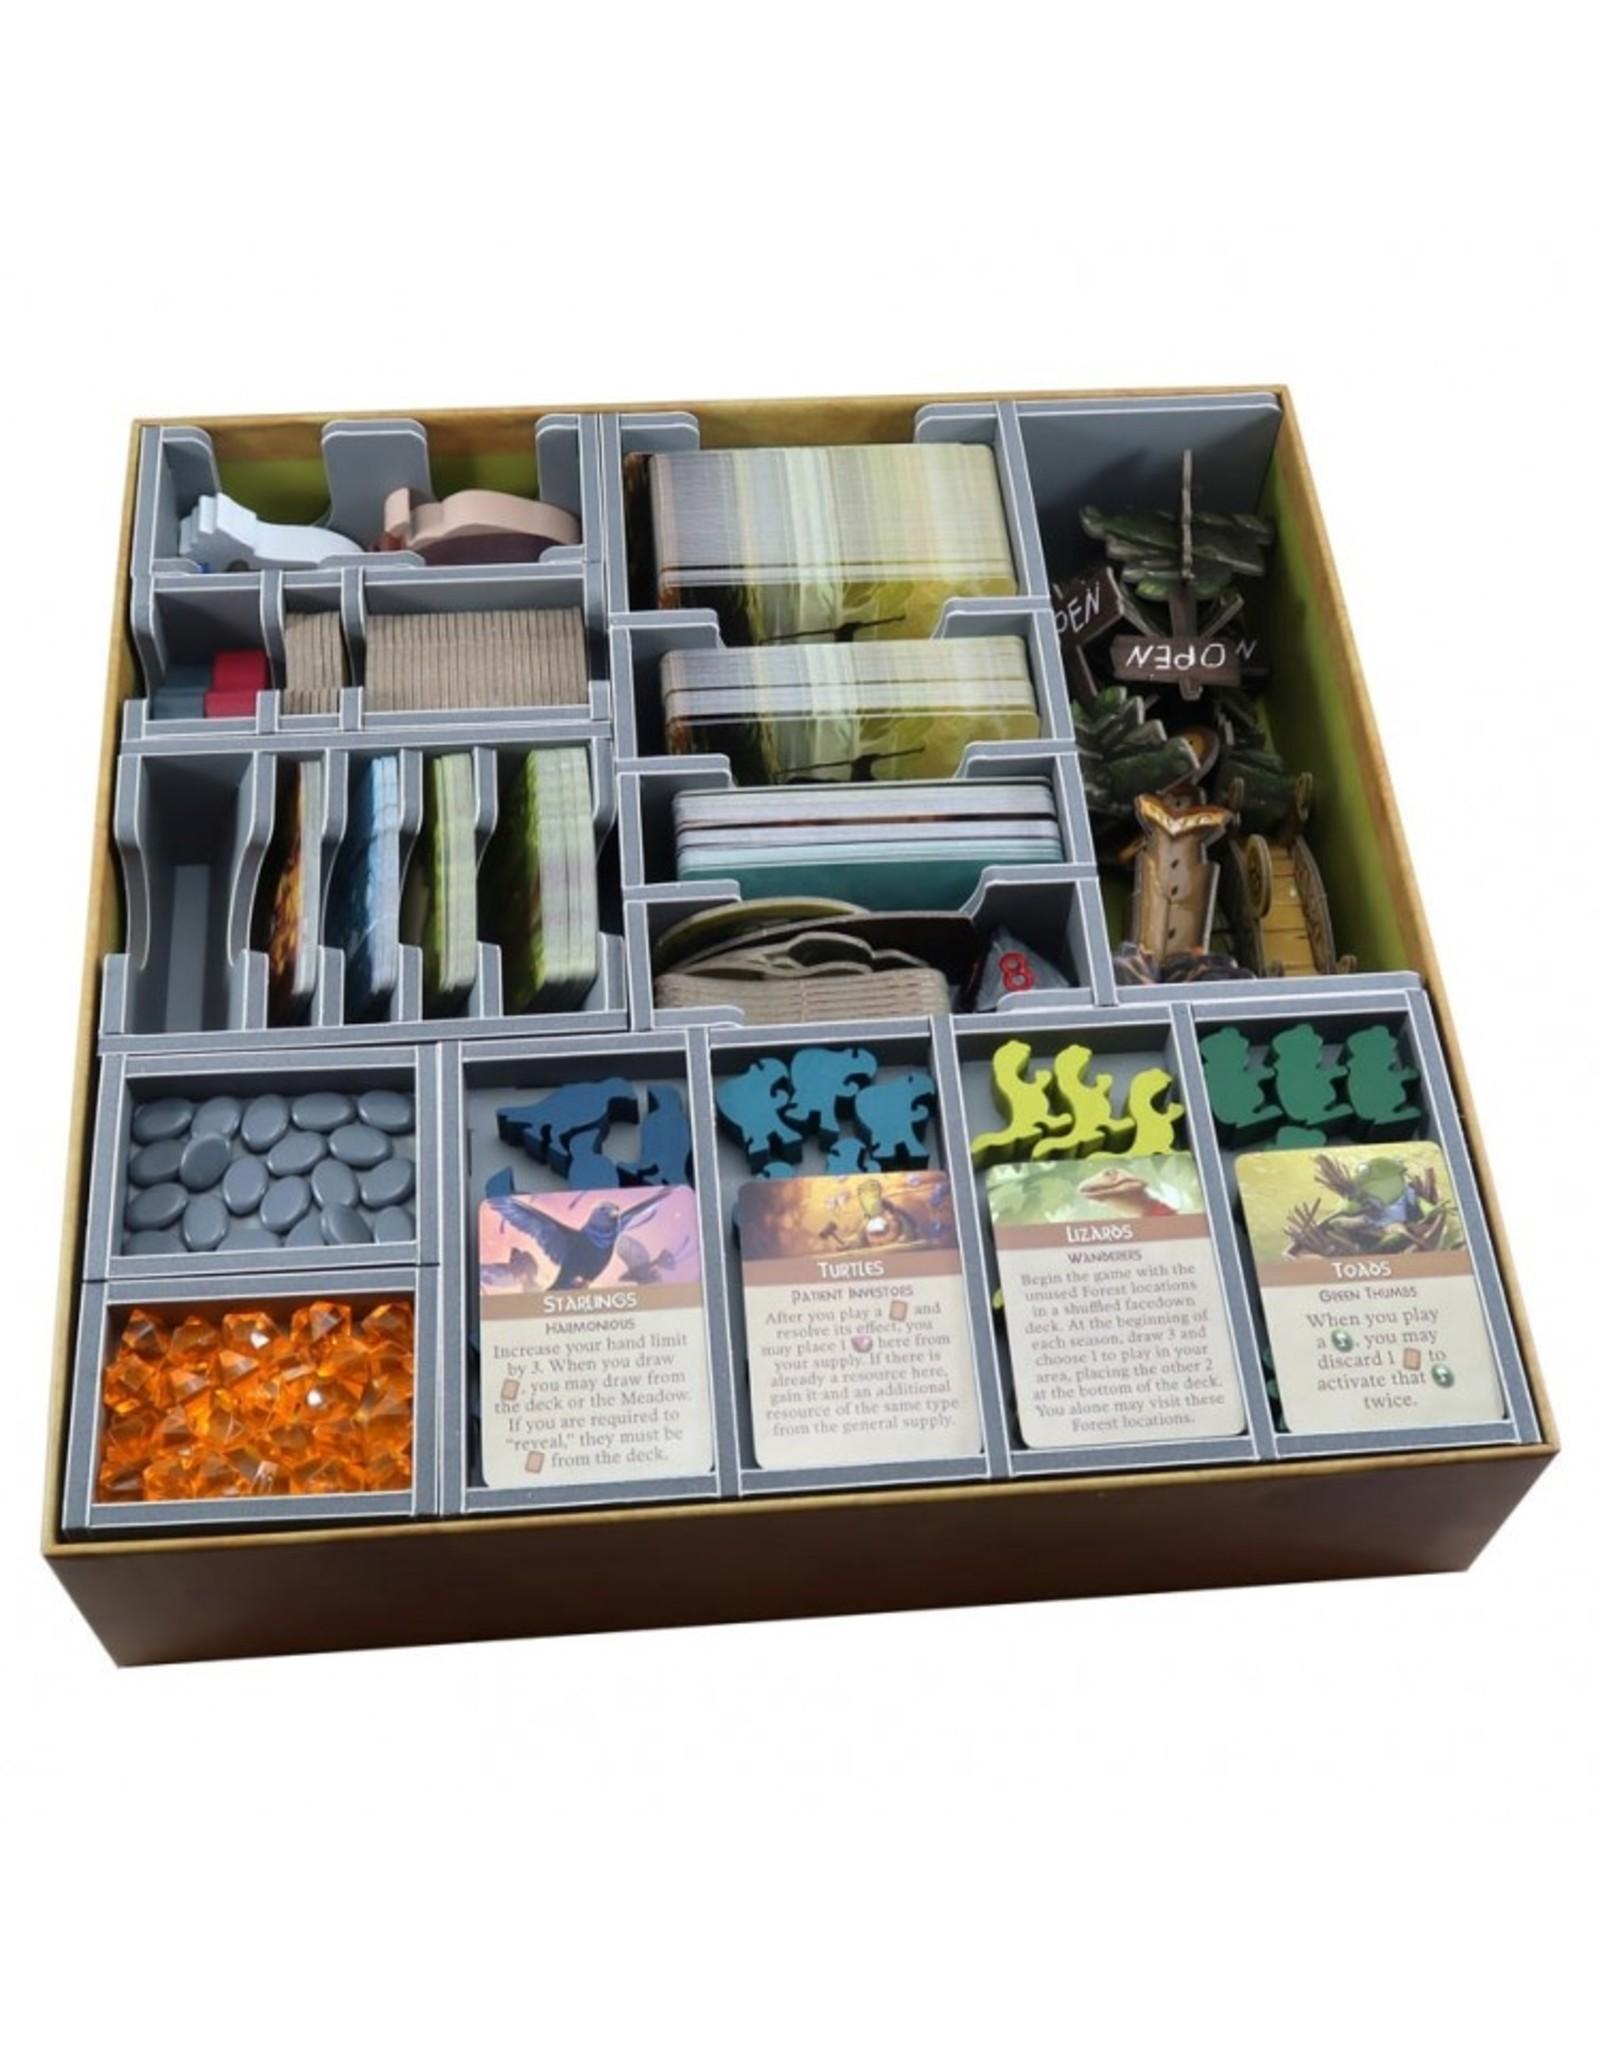 Folded Space Box Insert: Everdell & Exps